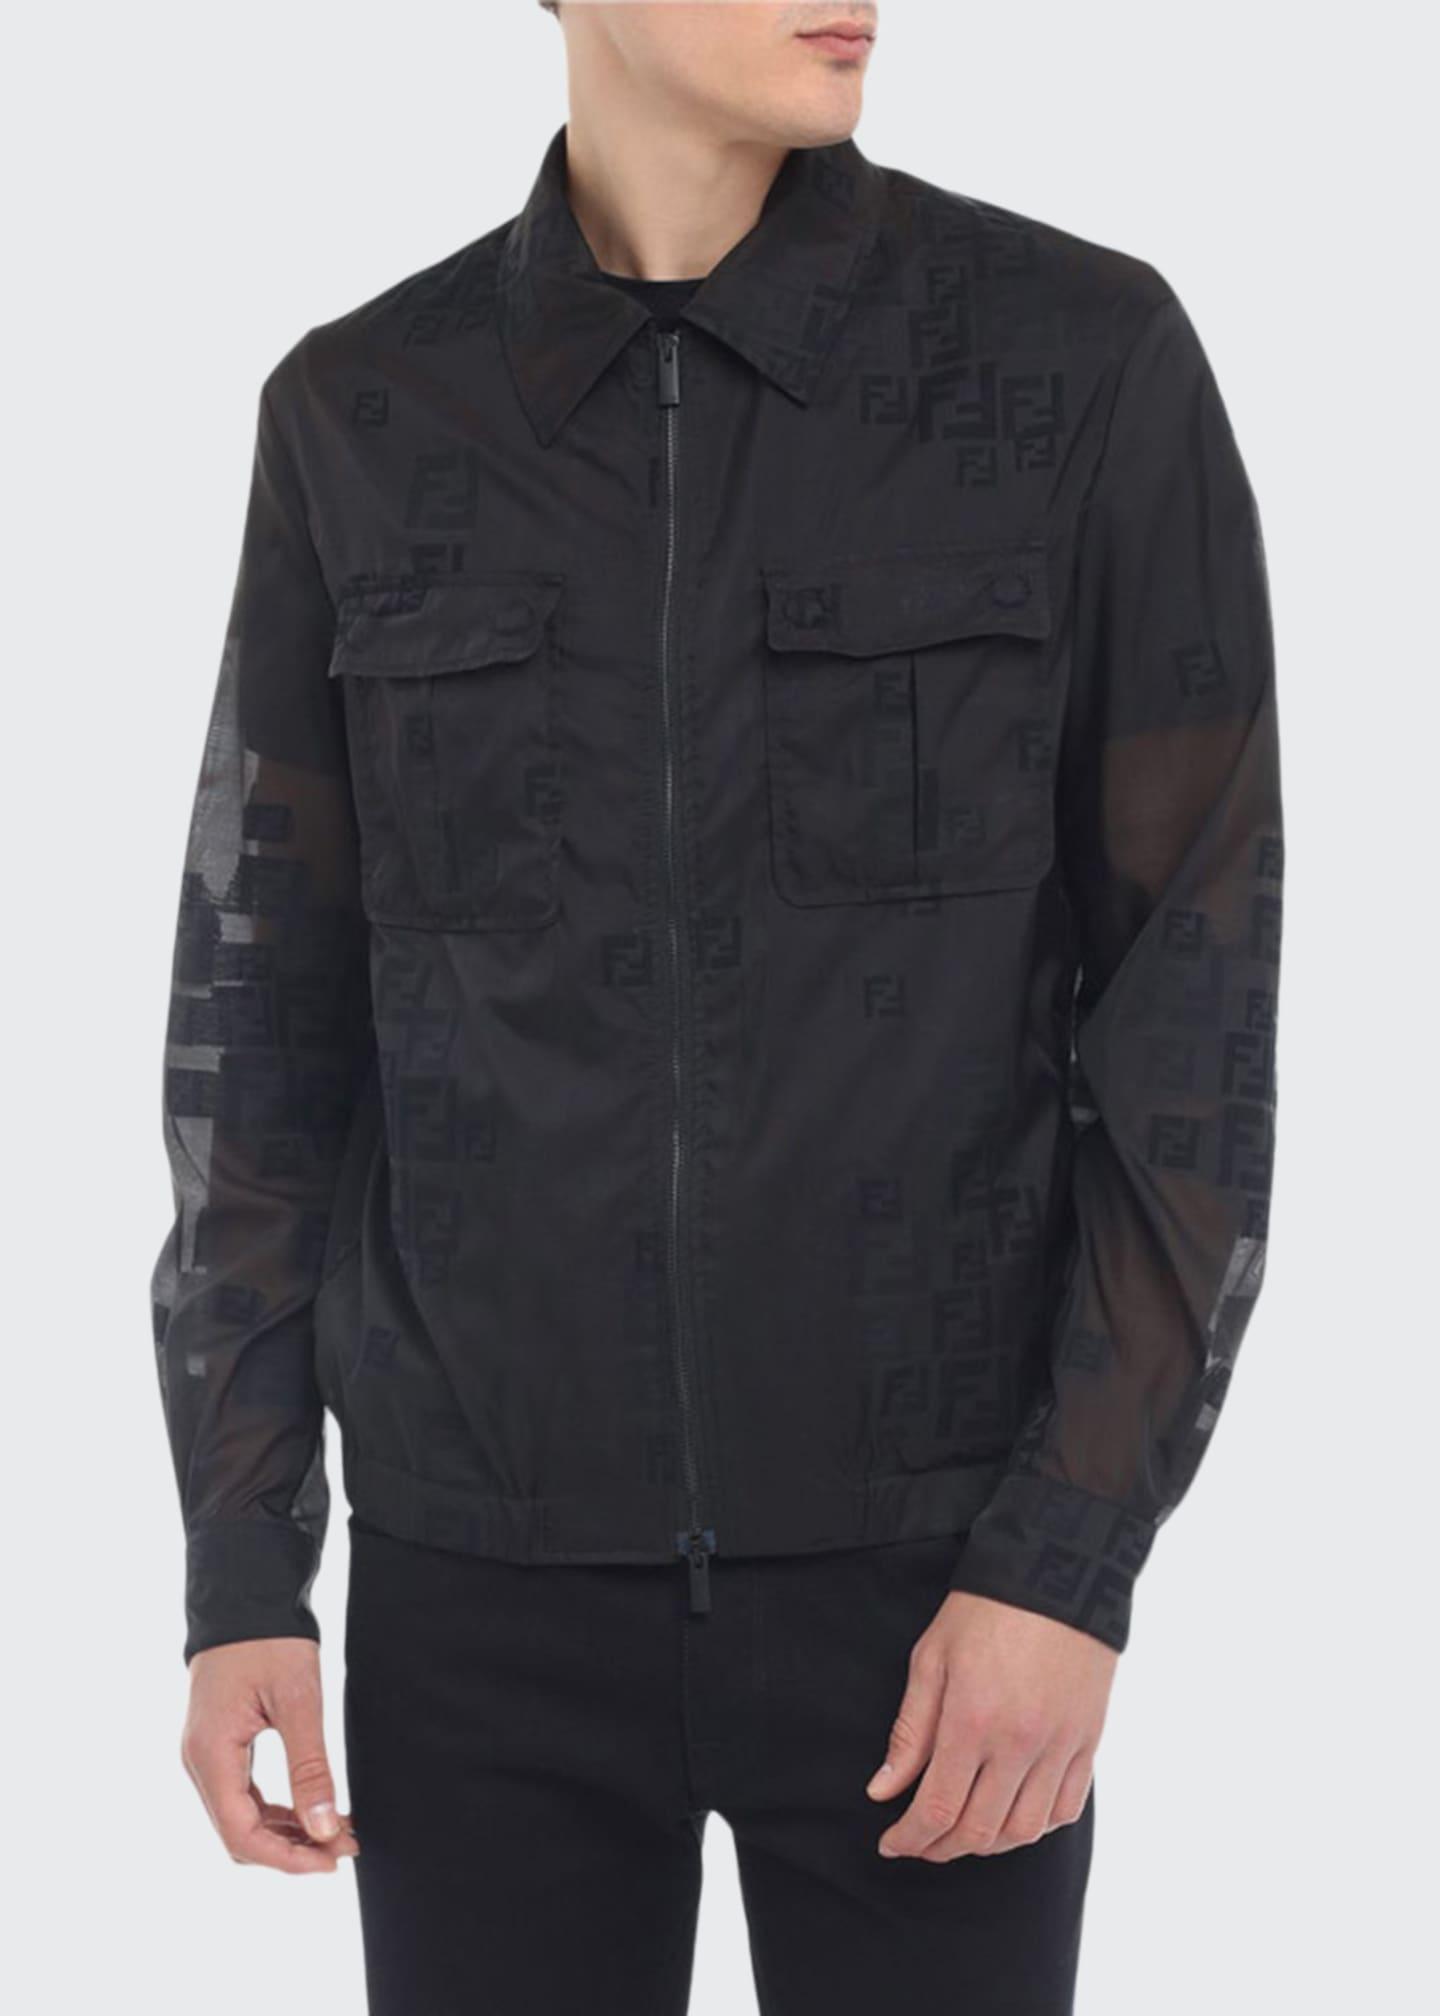 Fendi Men's Faded-FF Sheer Bomber Jacket